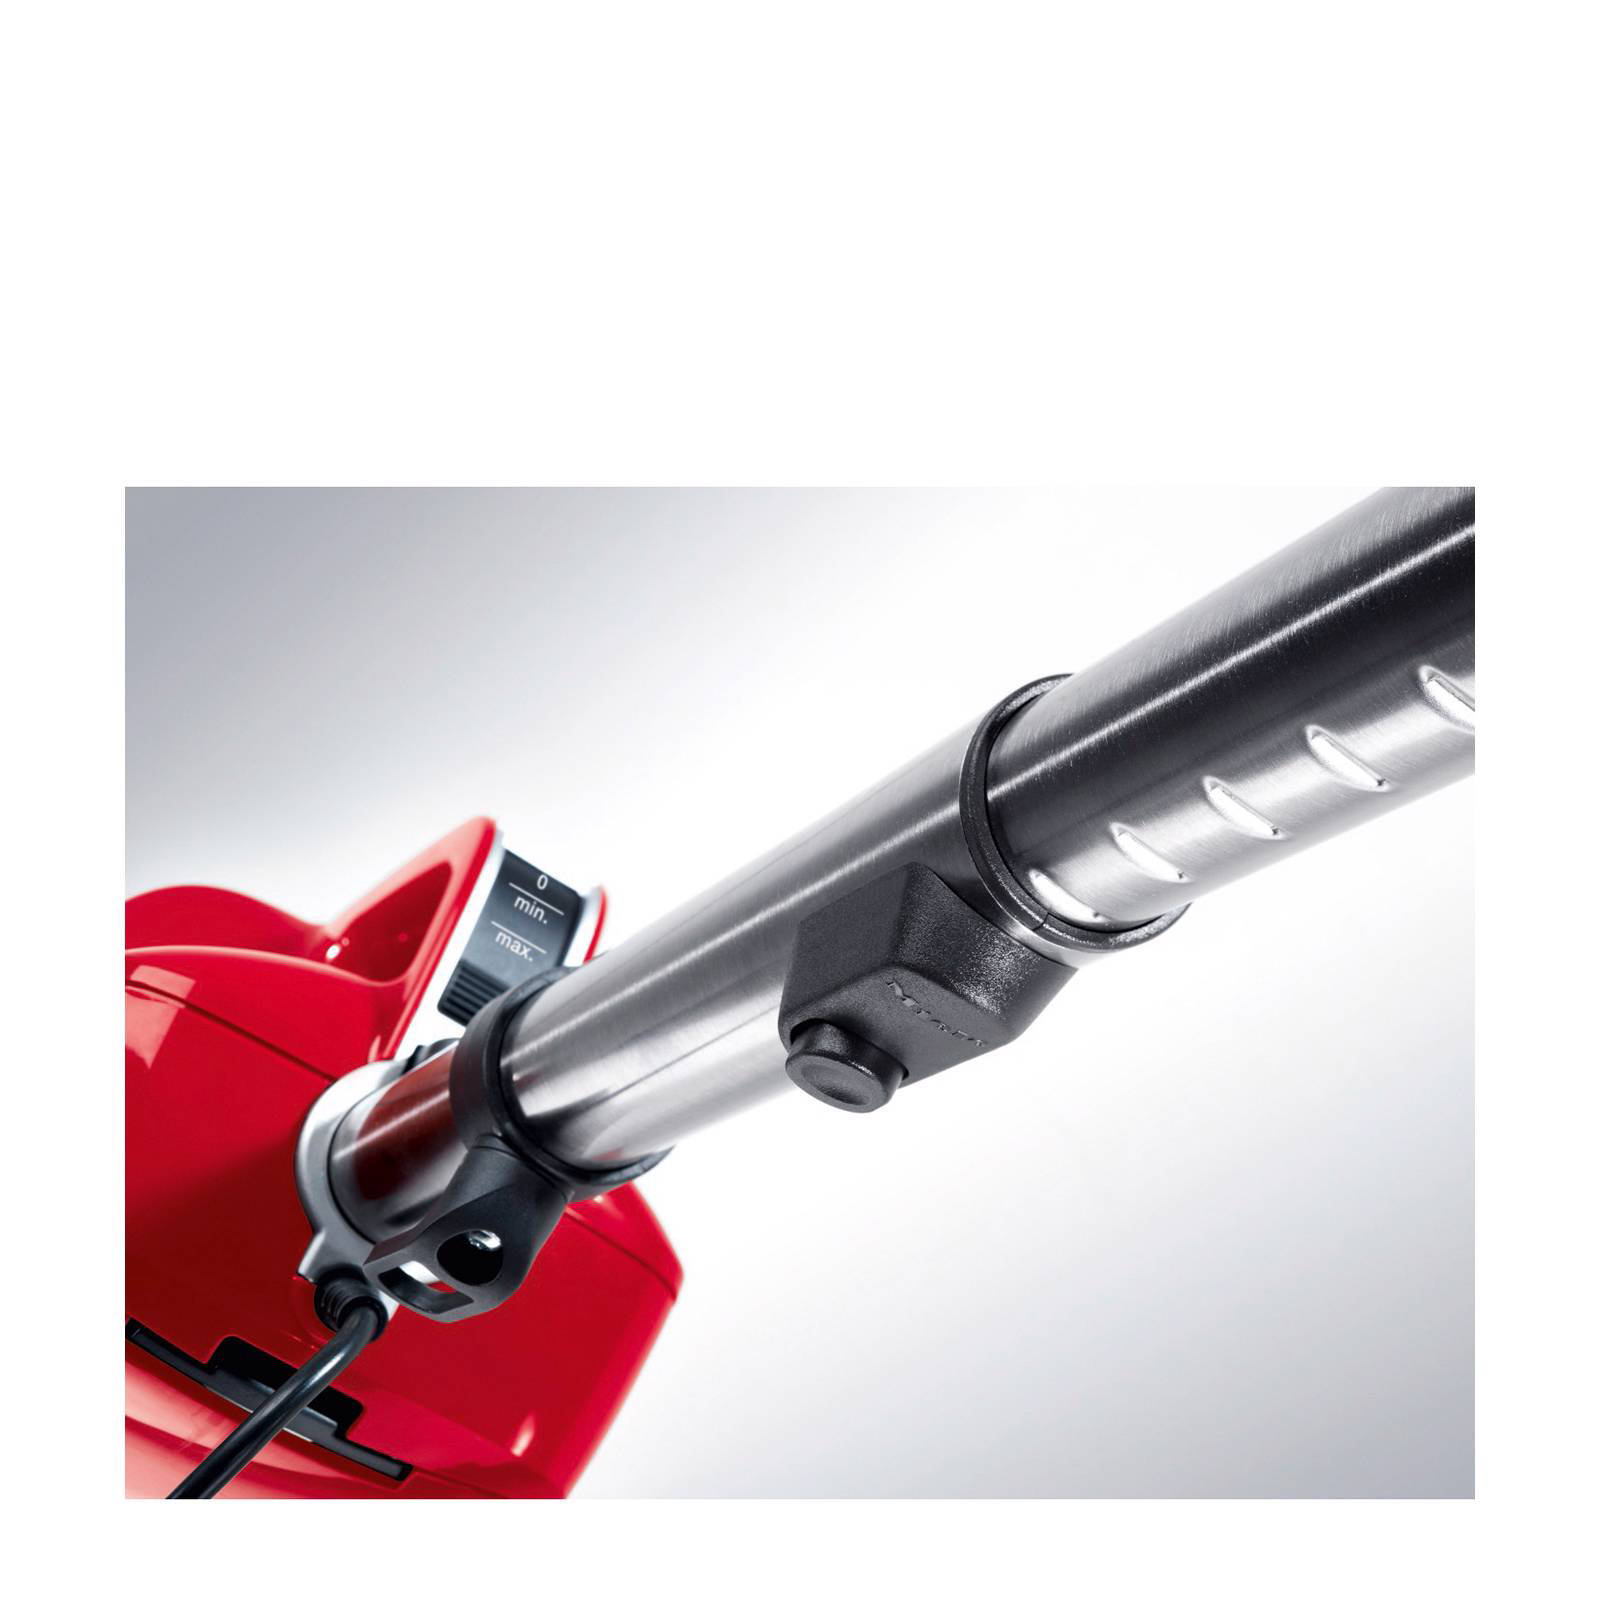 Onwijs Miele Swing H1 steelstofzuiger | wehkamp DT-81